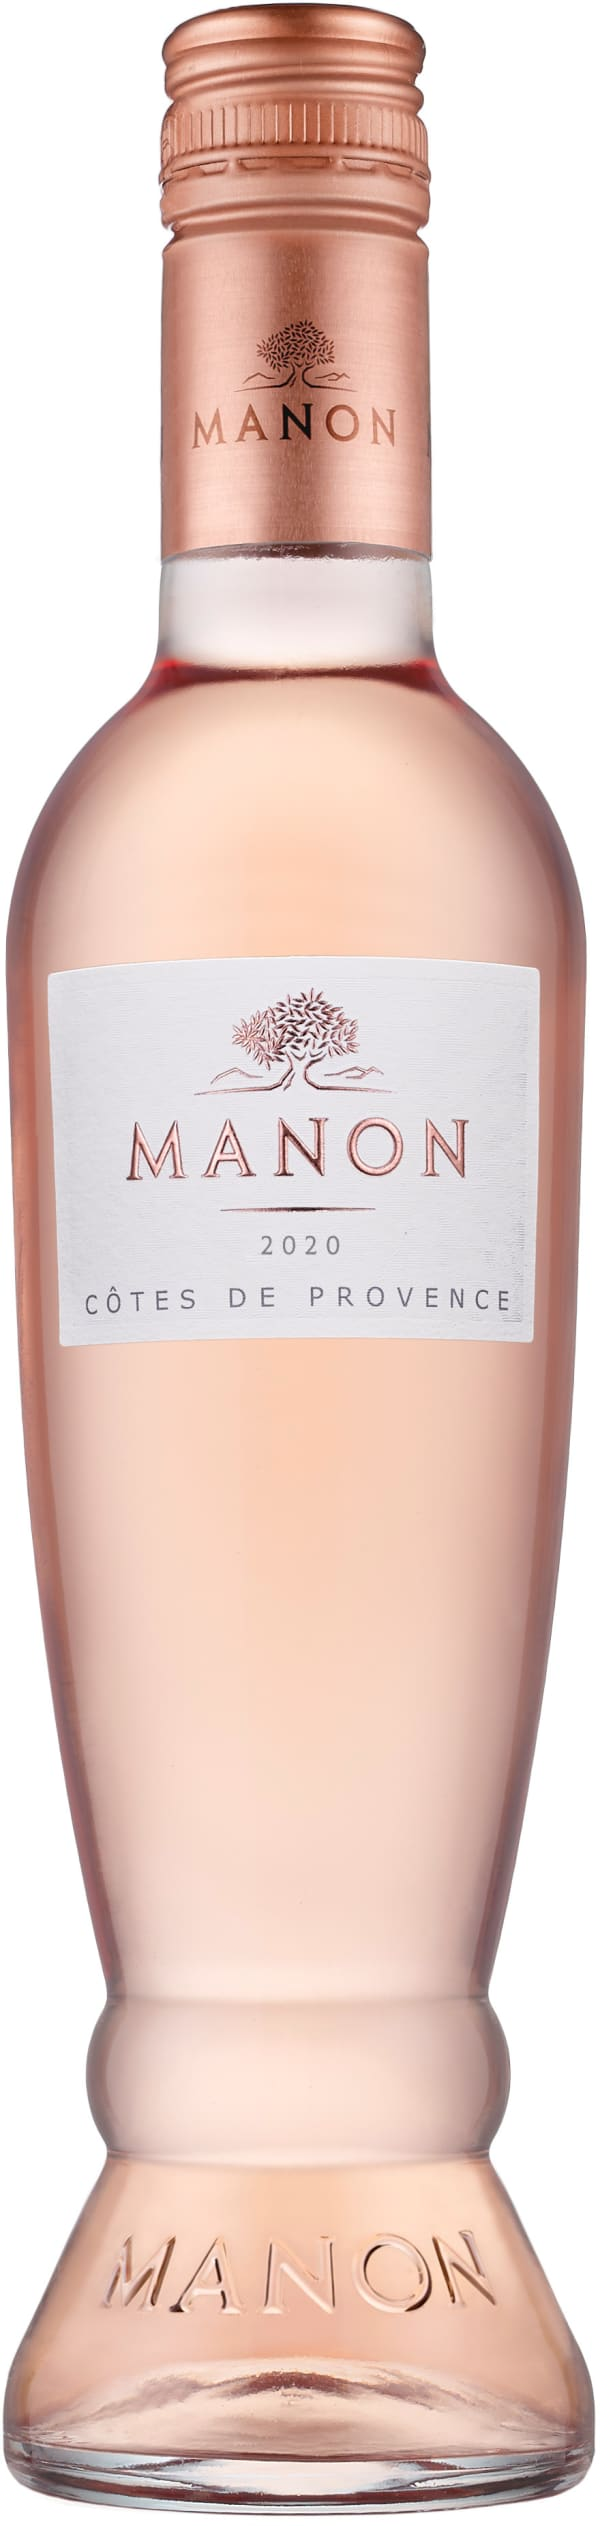 Manon 2020